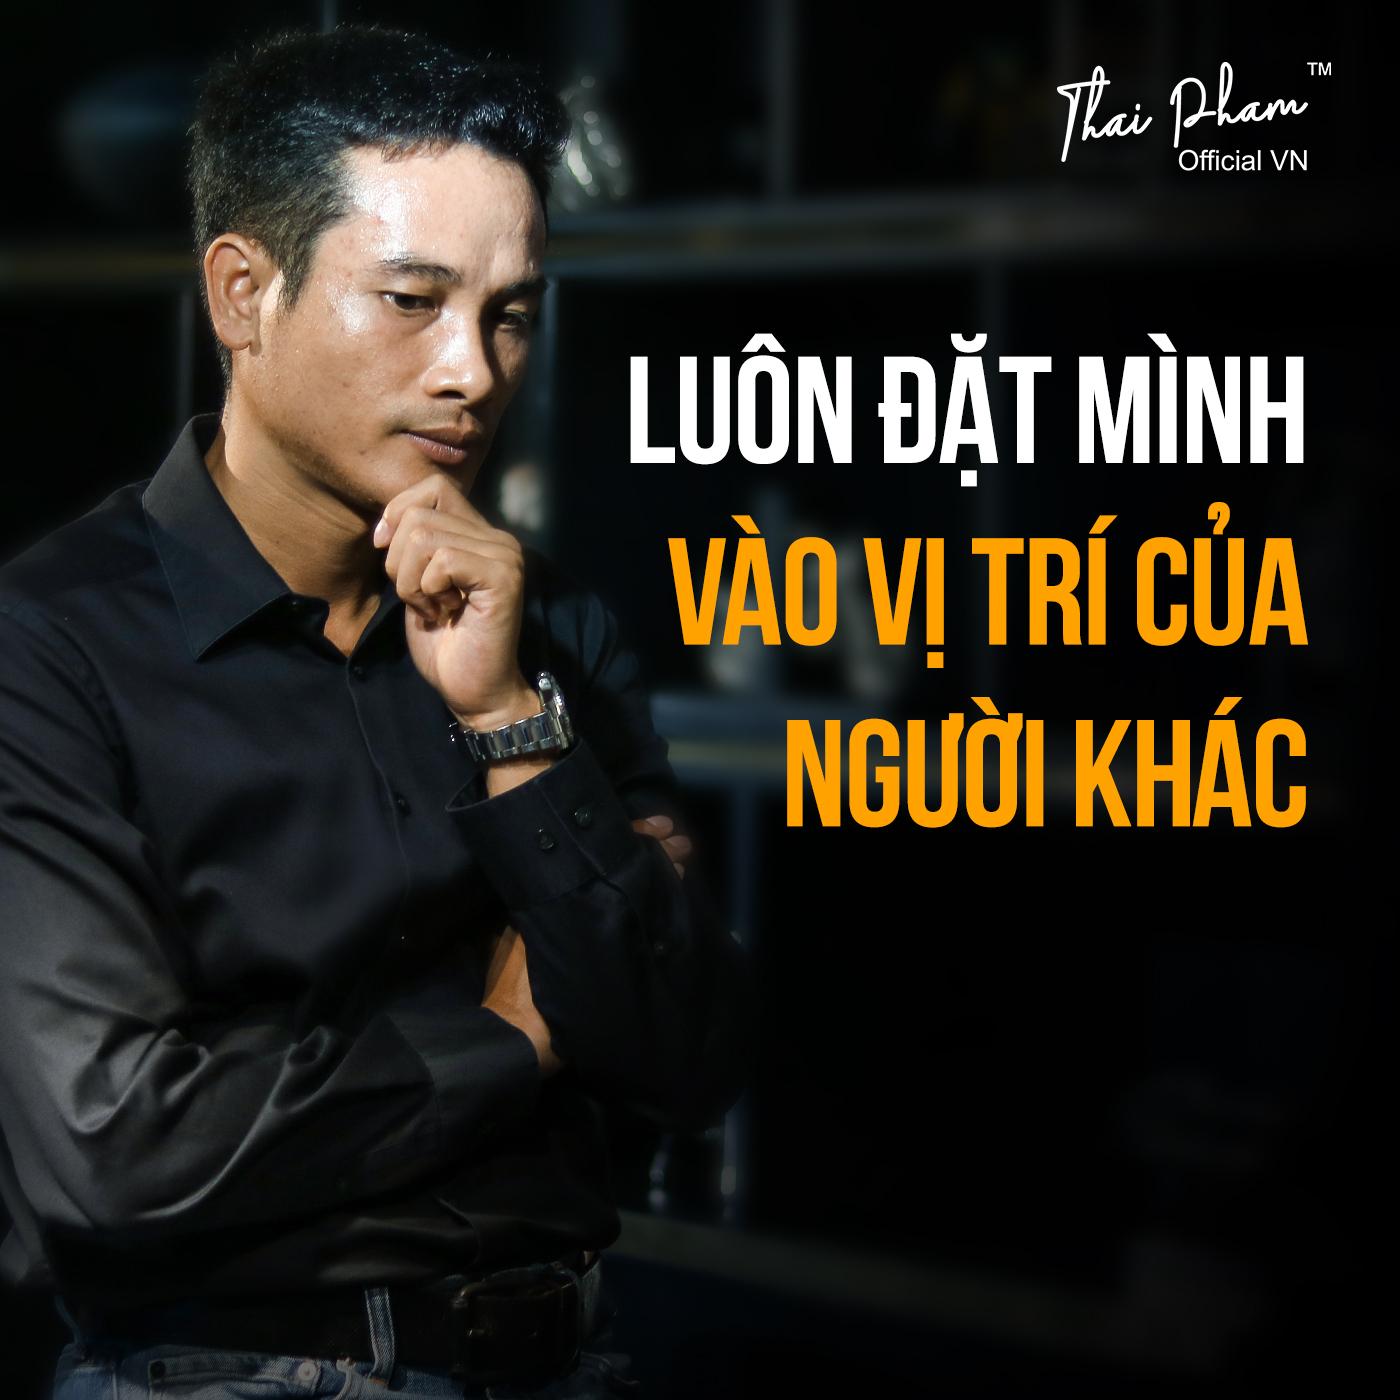 luon-dat-minh-vao-vi-tri-cua-nguoi-khac-thai-pham-blo